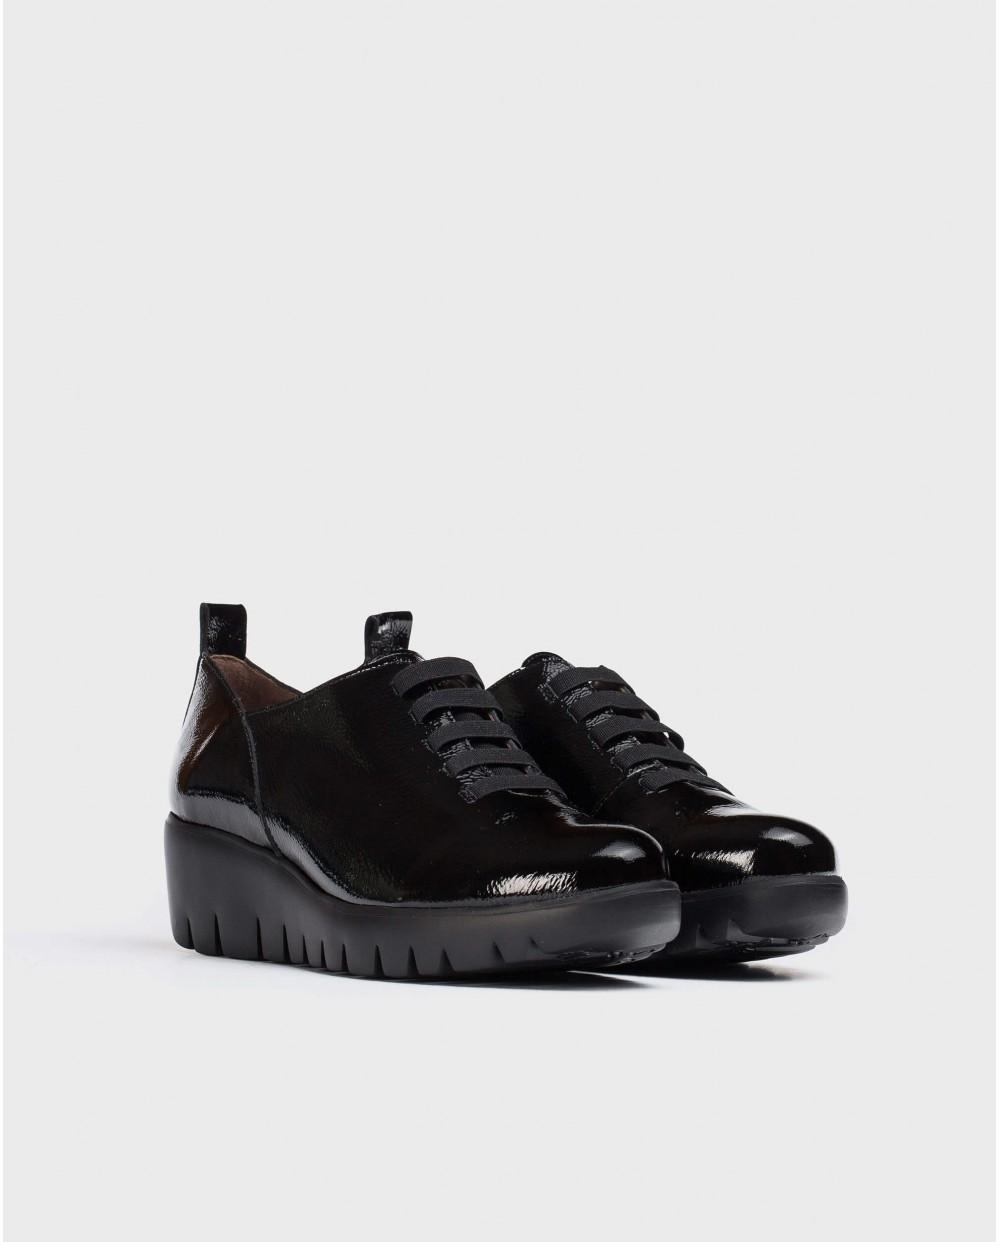 Wonders-Wedges-Soft Black patent leather Sneaker